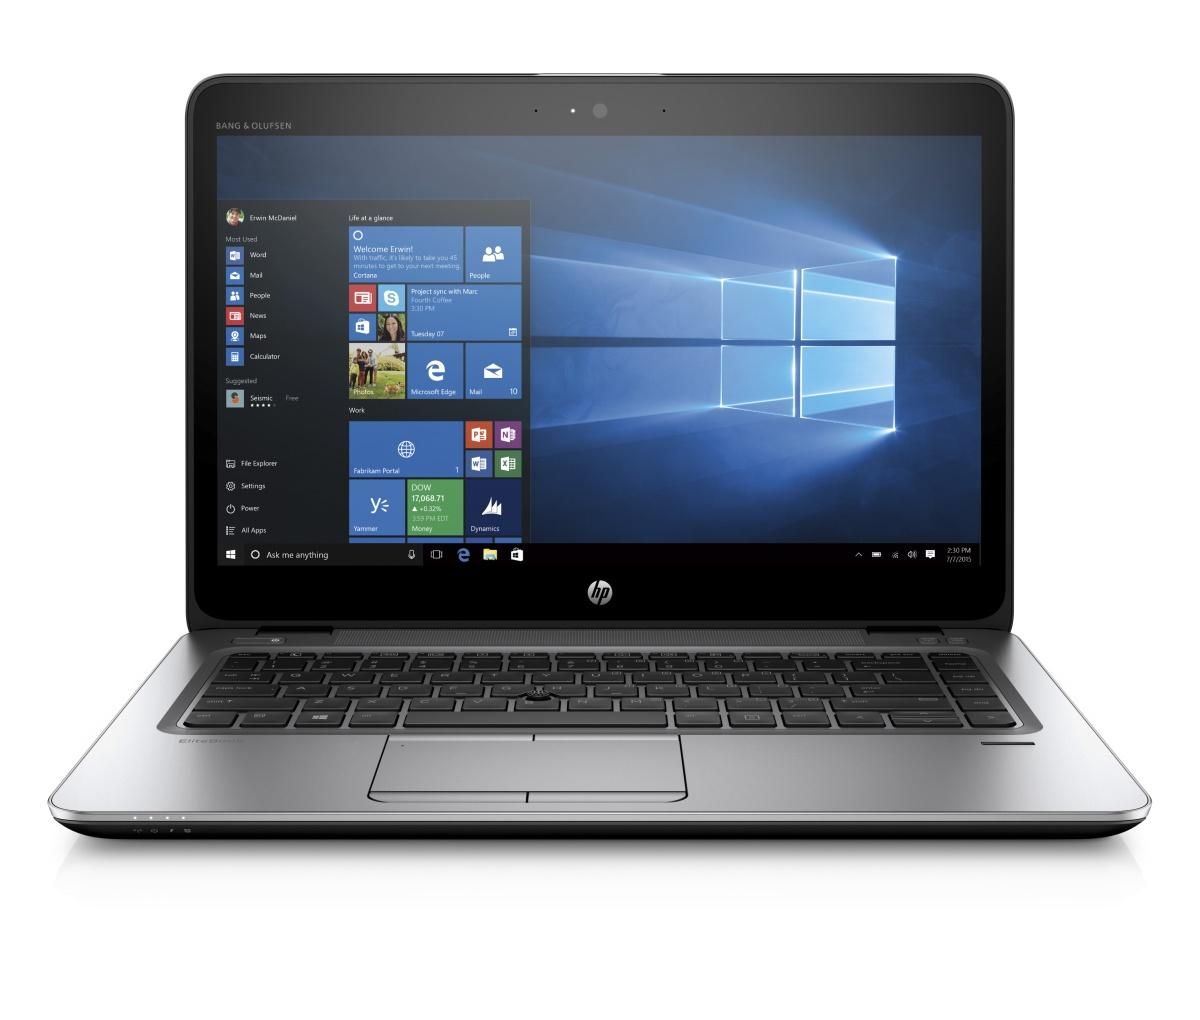 "HP EliteBook 840 G3 i5-6200U/4GB/256GB SSD/14"" FHD/ backlit keyb /Win 10 Pro downgraded"